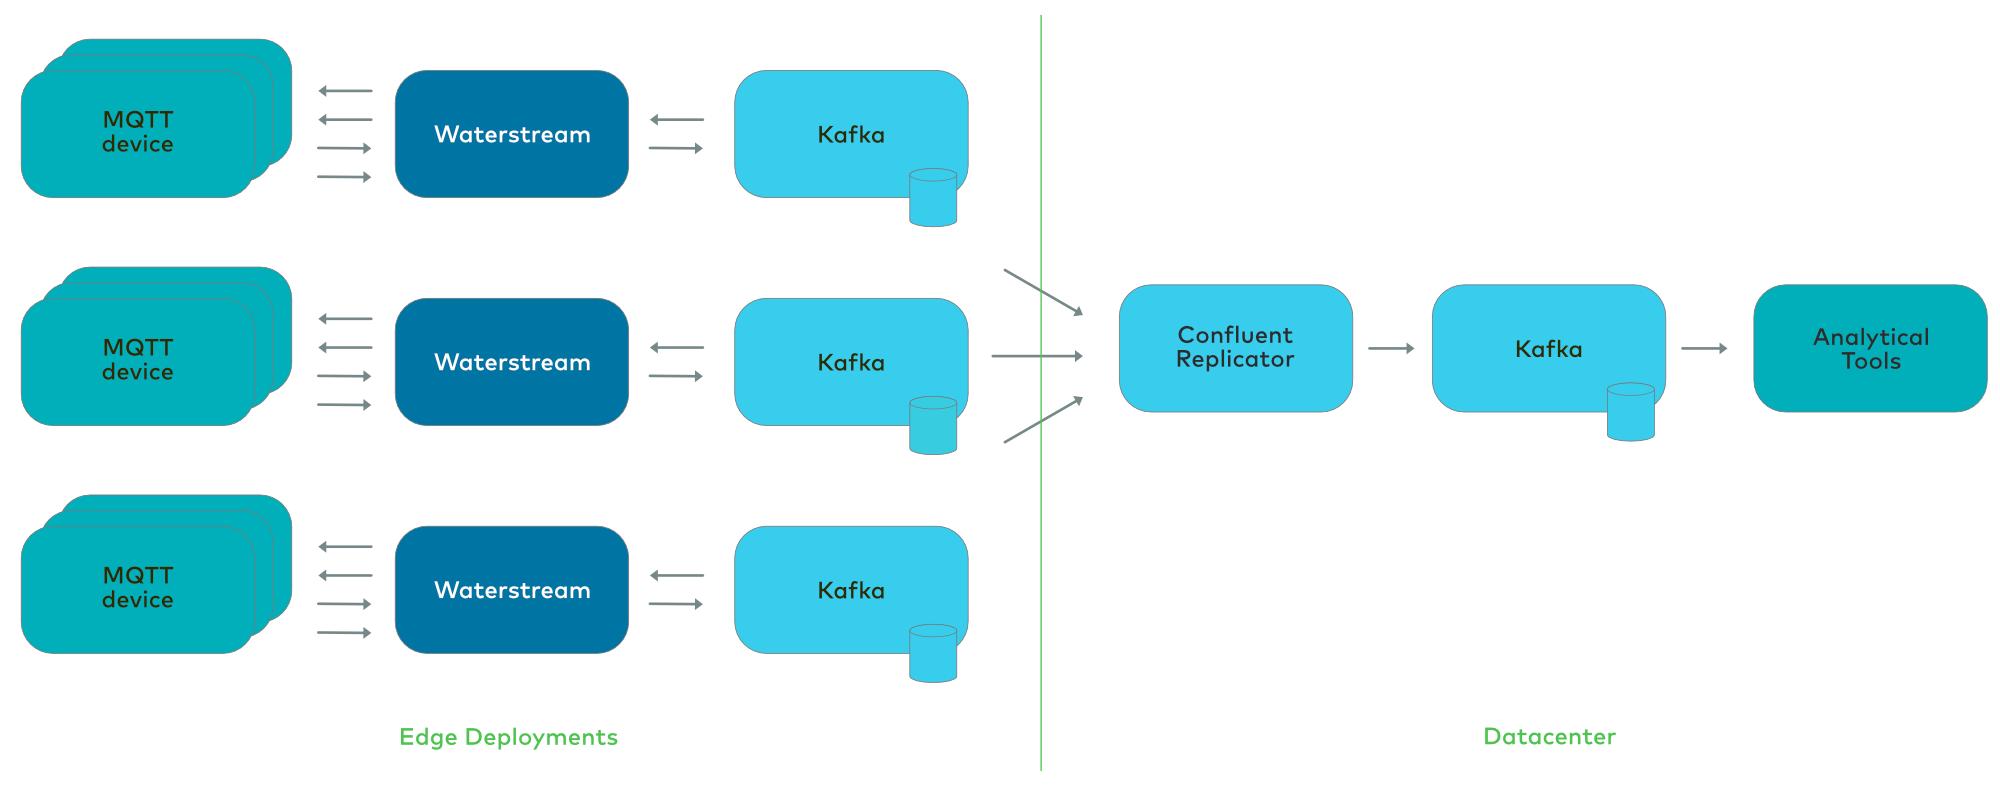 MQTT, Waterstream, and Kafka: Edge Deployments | Datacenter